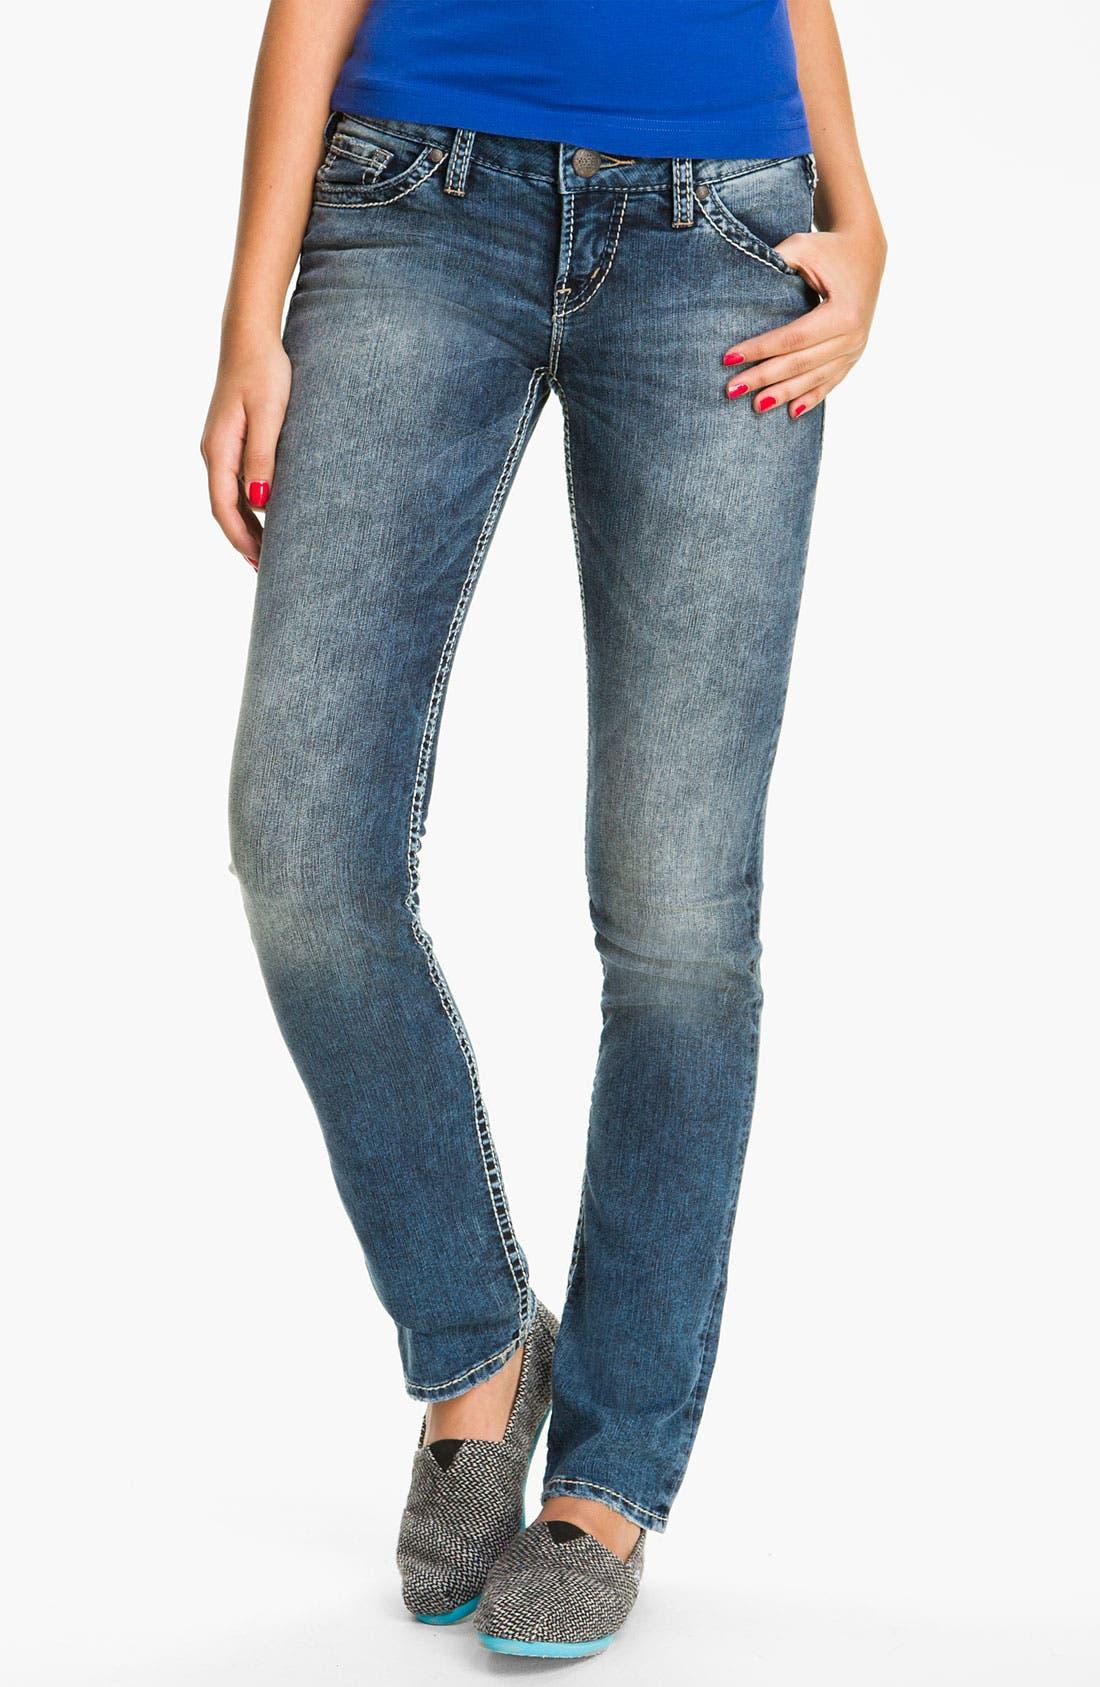 Alternate Image 2  - Silver Jeans Co. 'Berkeley' Straight Leg Jeans (Juniors)